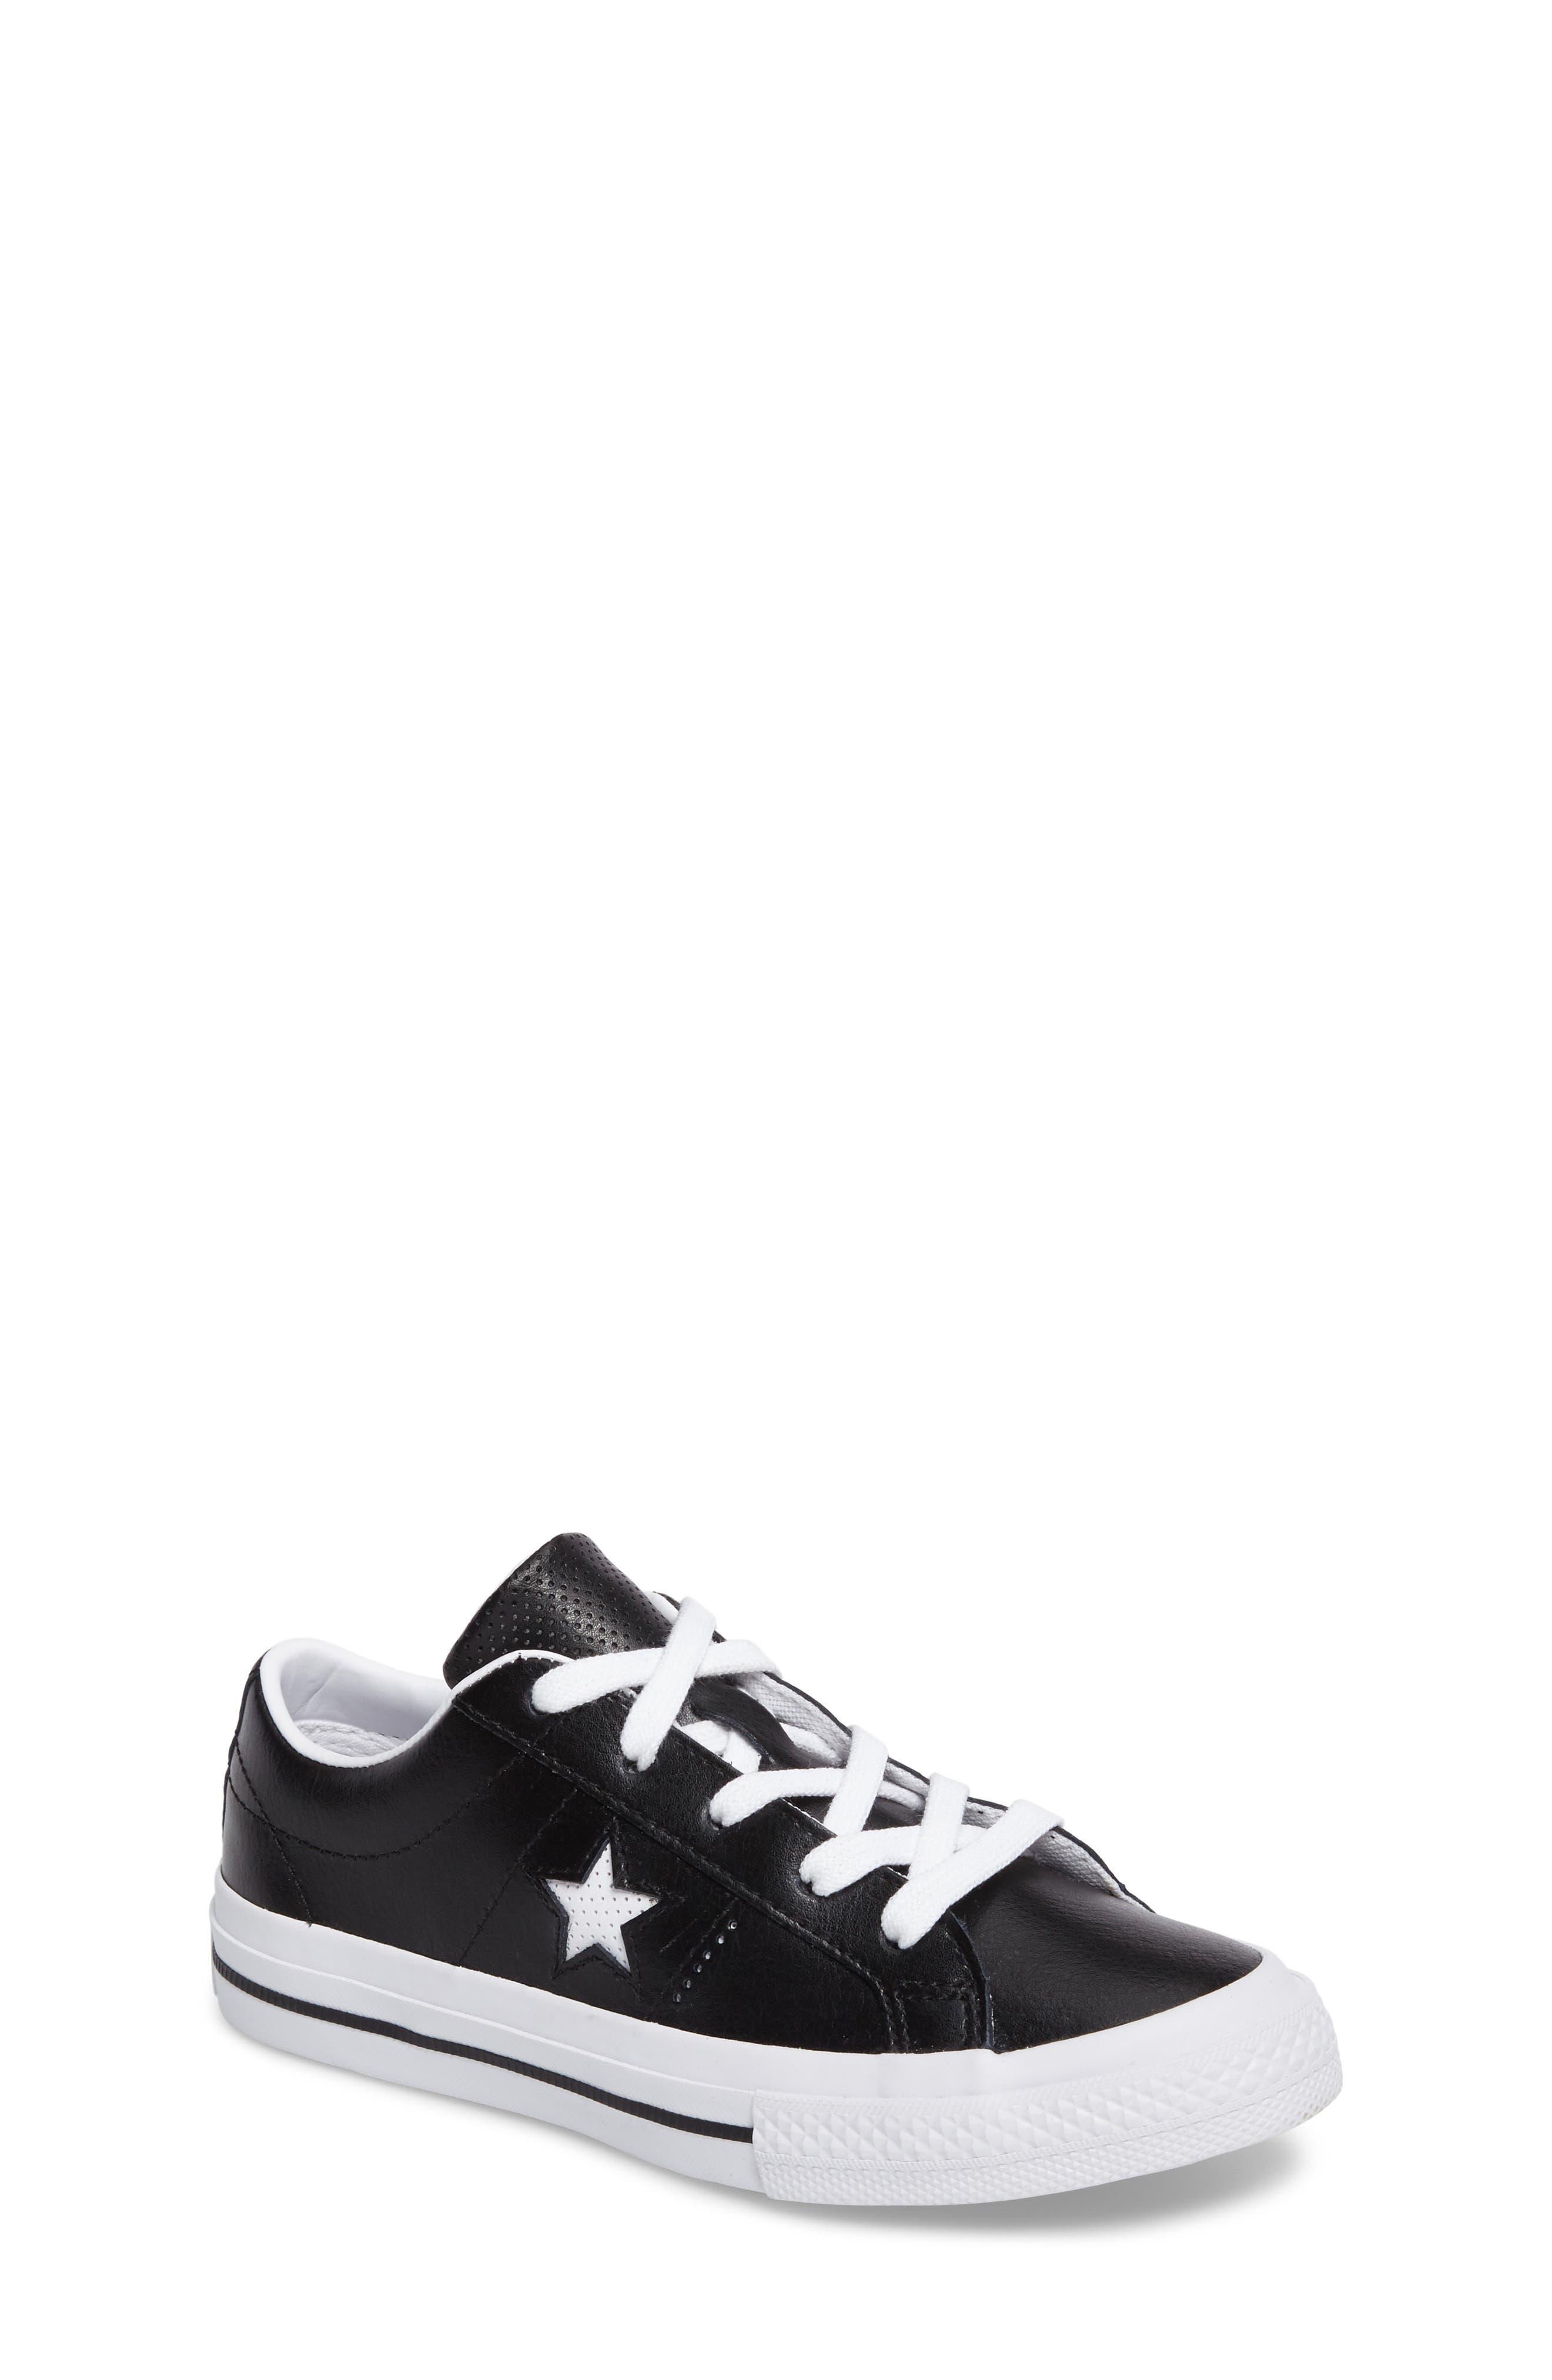 Converse Chuck Taylor® All Star® One Star Sneaker (Toddler, Little Kid & Big Kid)